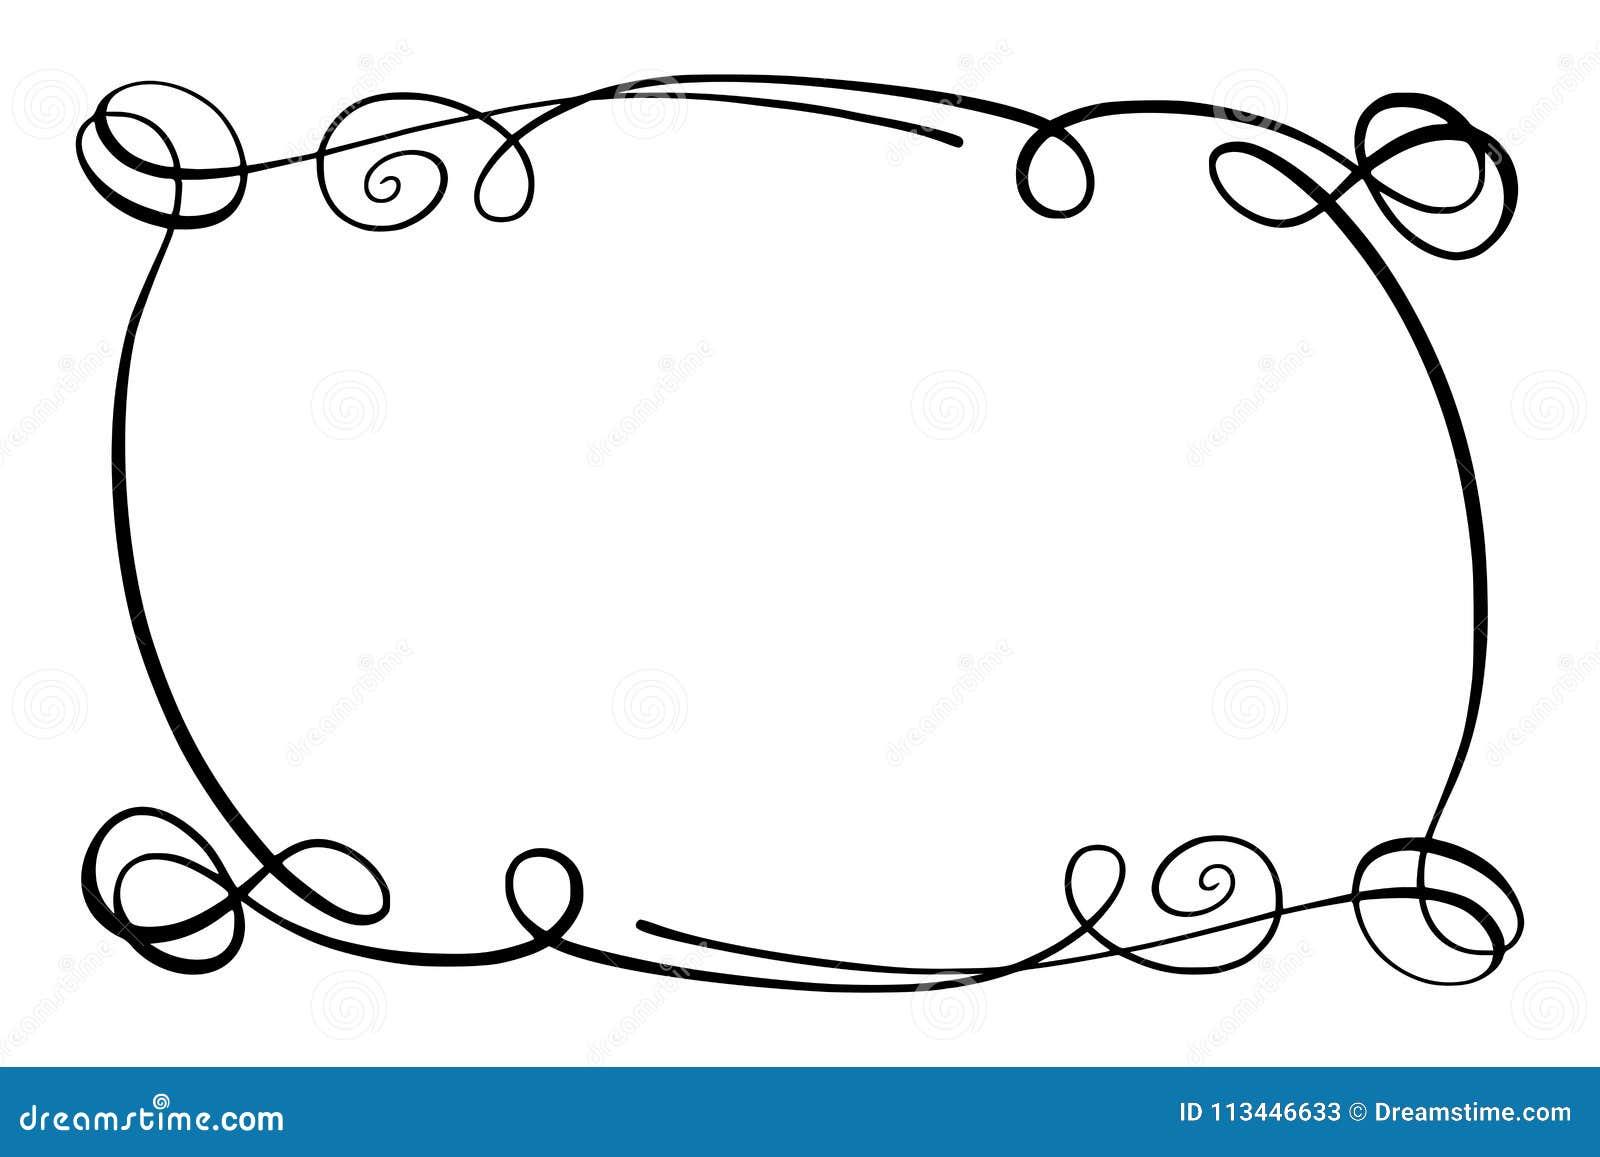 black white squiggle border stock illustrations  u2013 107